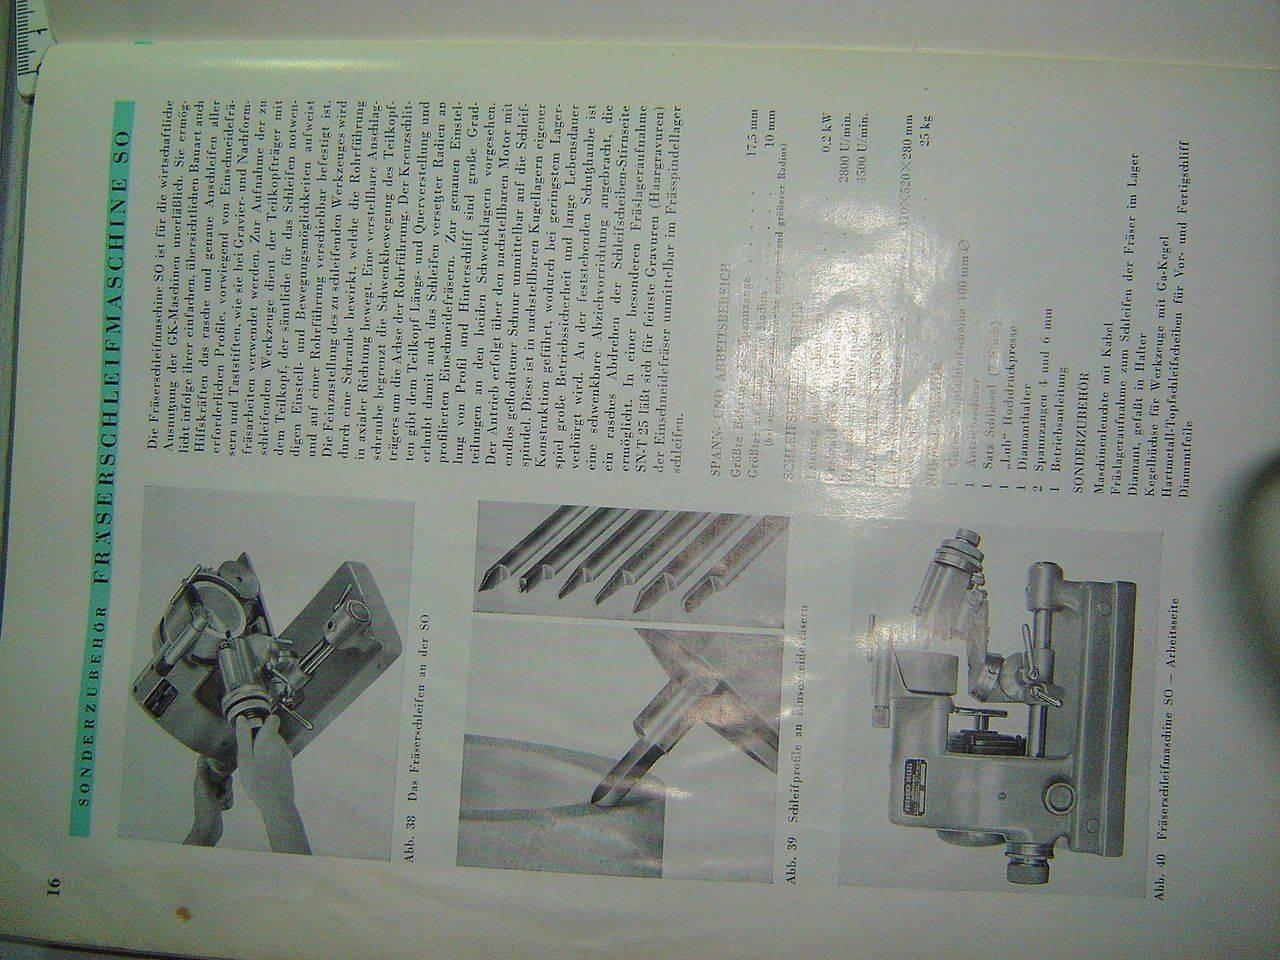 DSC04093.JPG